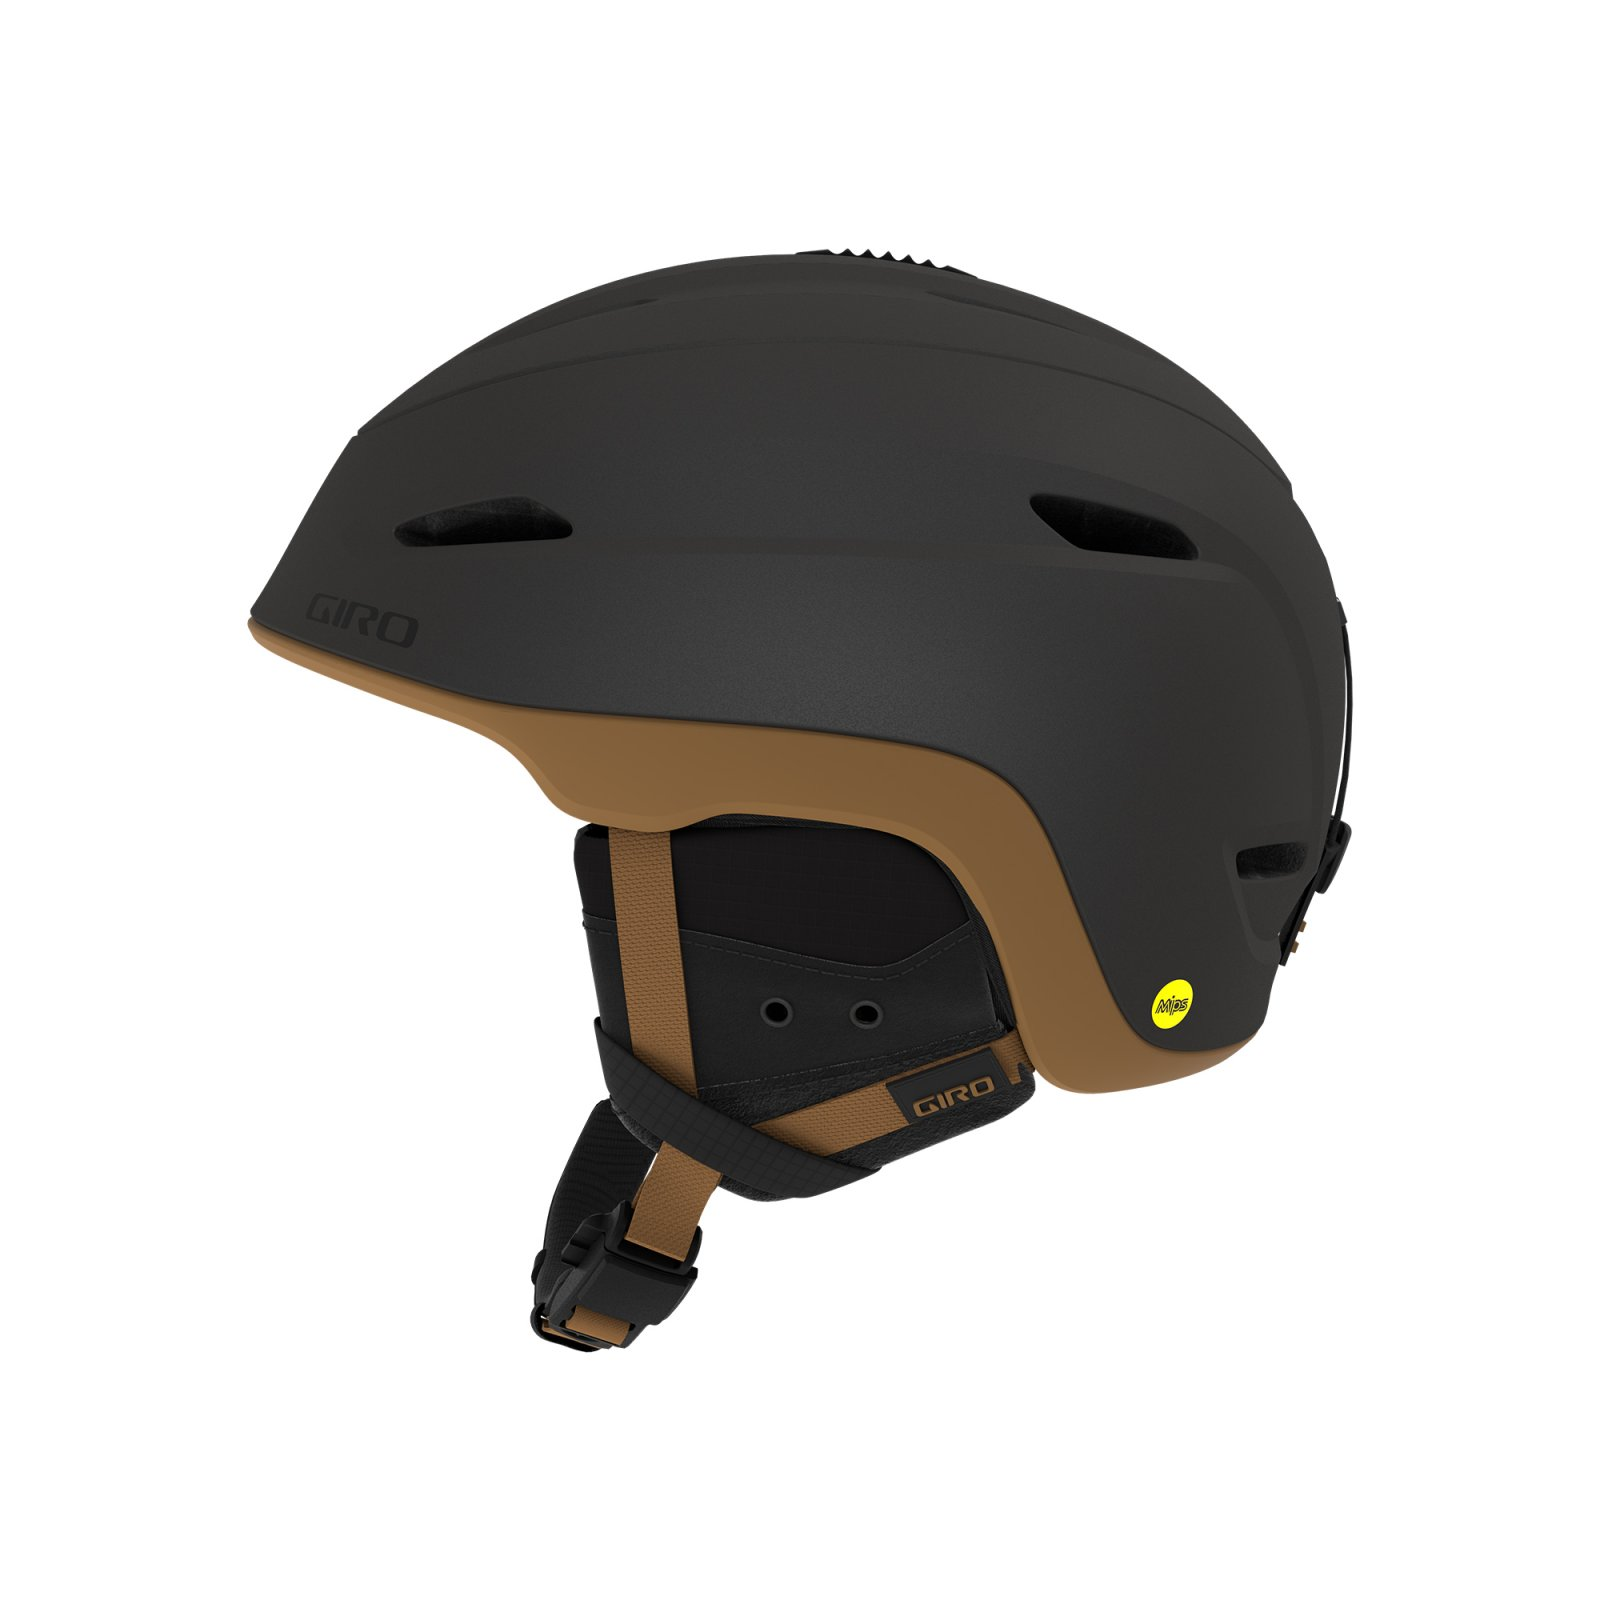 Giro Zone MIPS Helmet - Metallic Coal / Tan